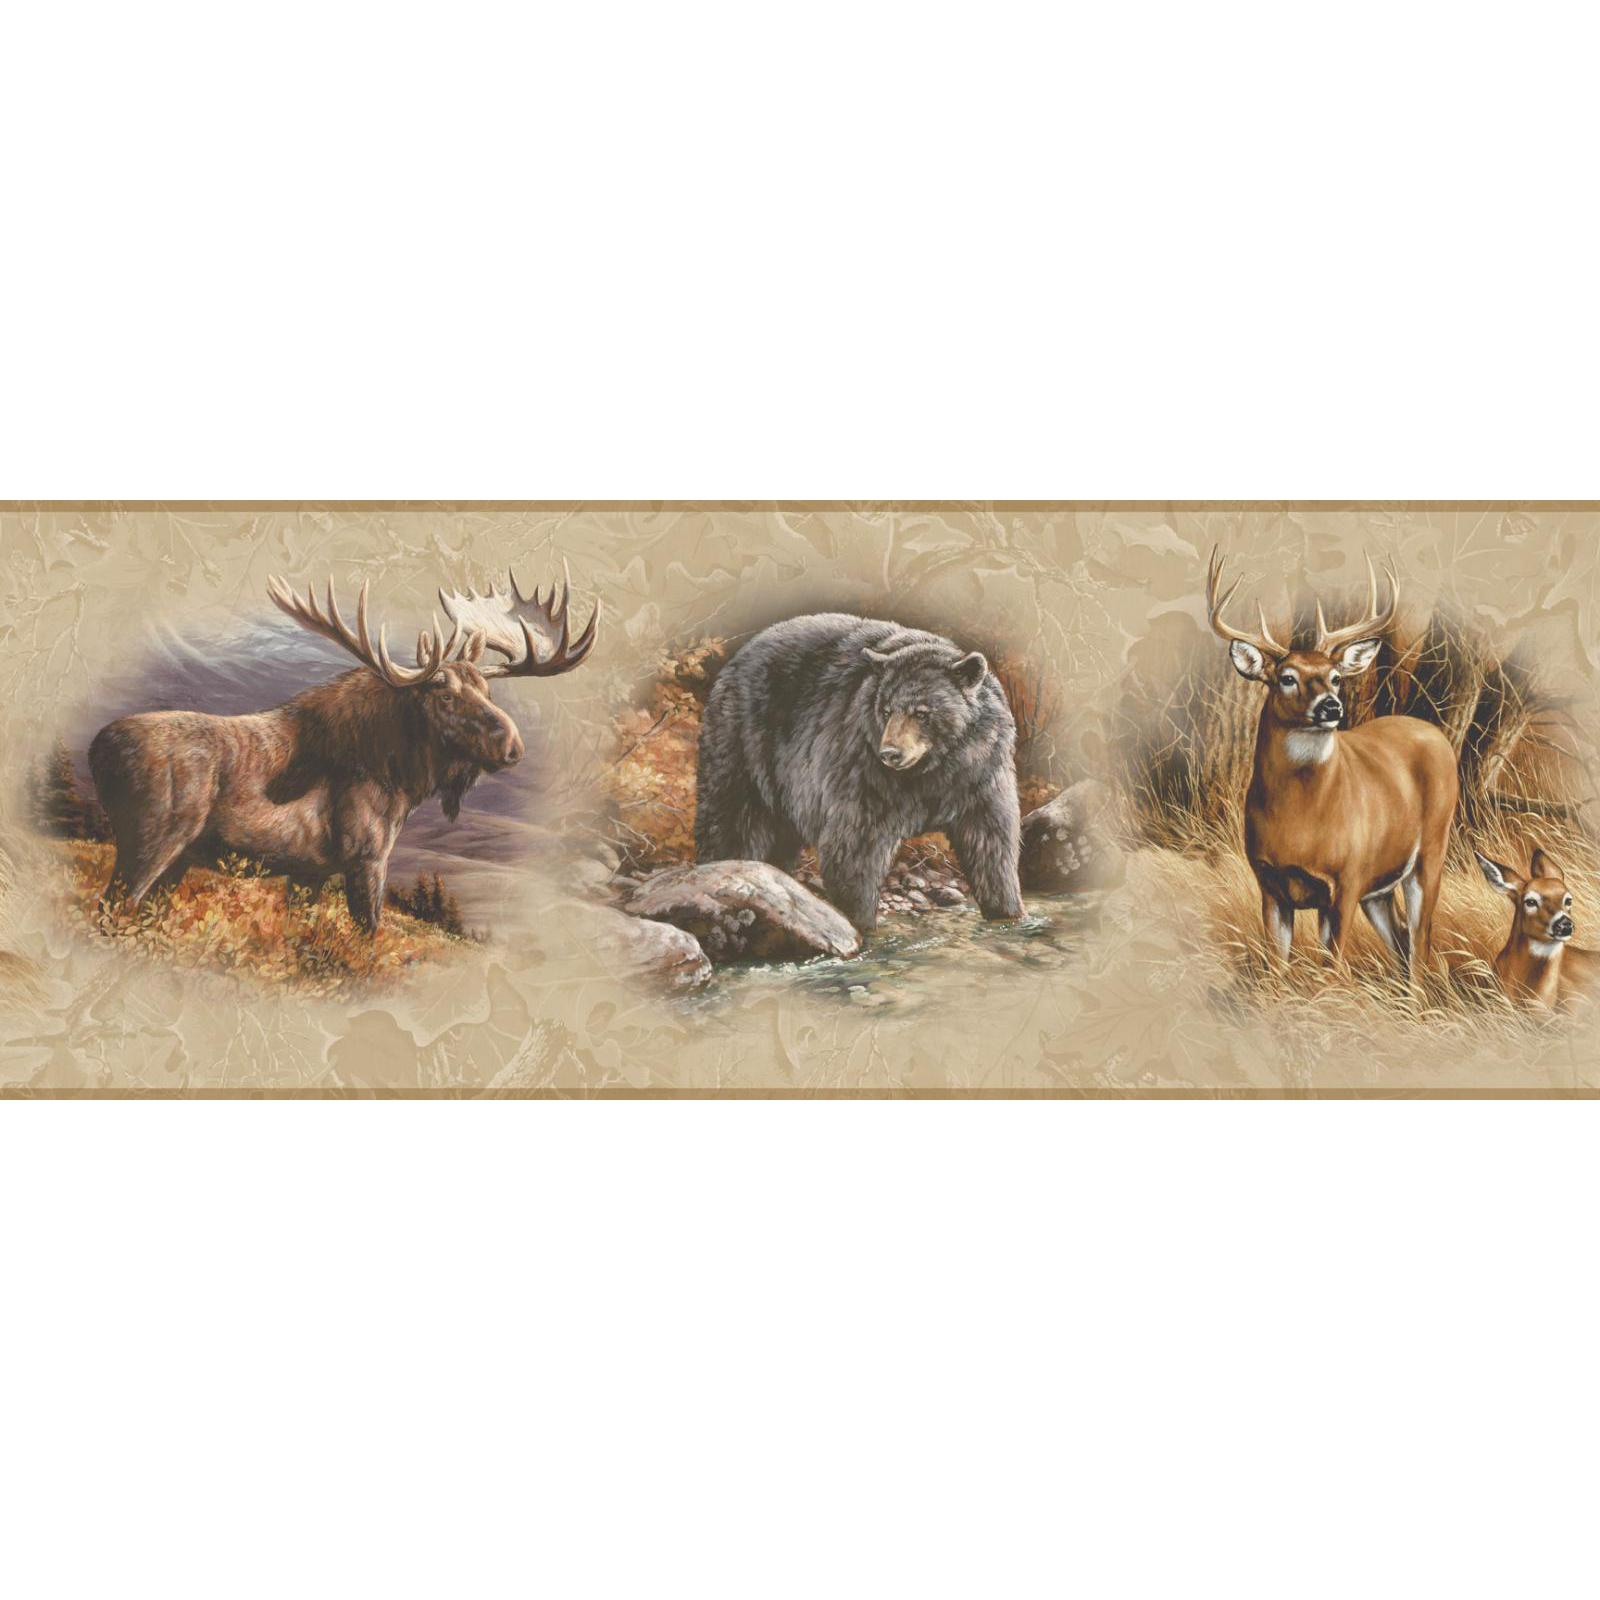 York Wallcoverings Border  North American Animals Border in Golden PartNumber: 00949793000P KsnValue: 2219660 MfgPartNumber: WD4305B